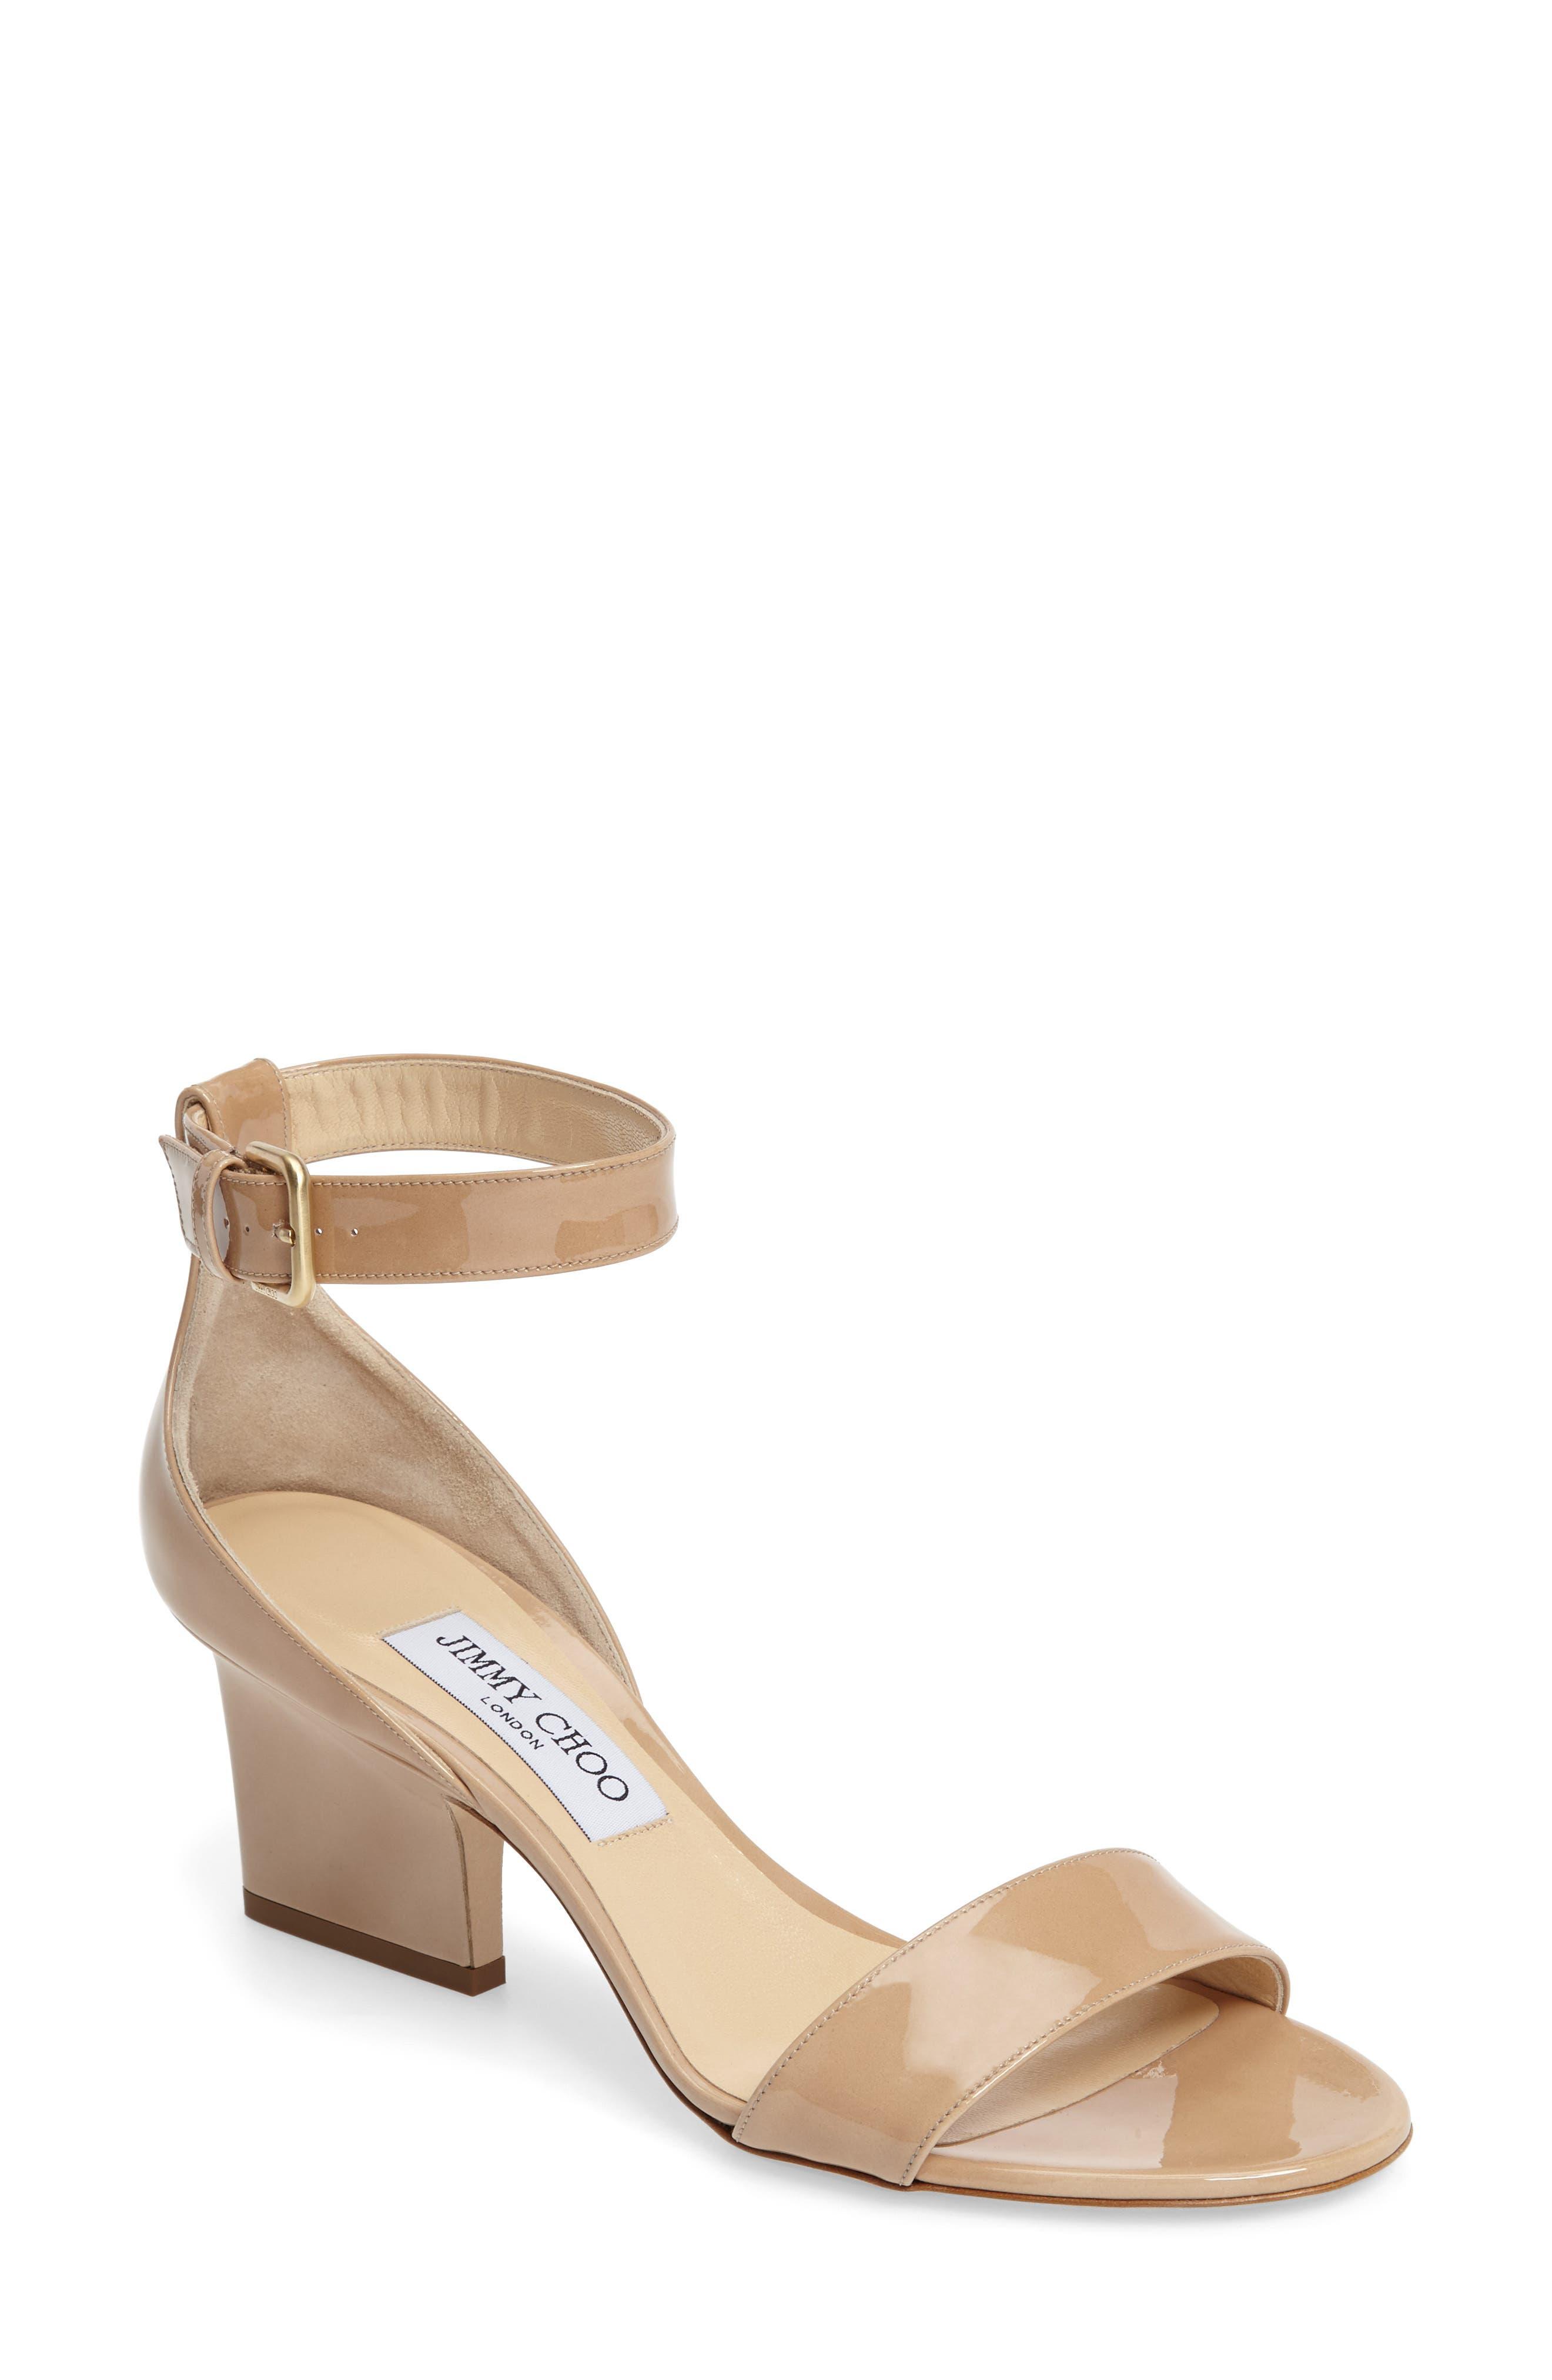 Edina Ankle Strap Sandal,                         Main,                         color, Nude Patent